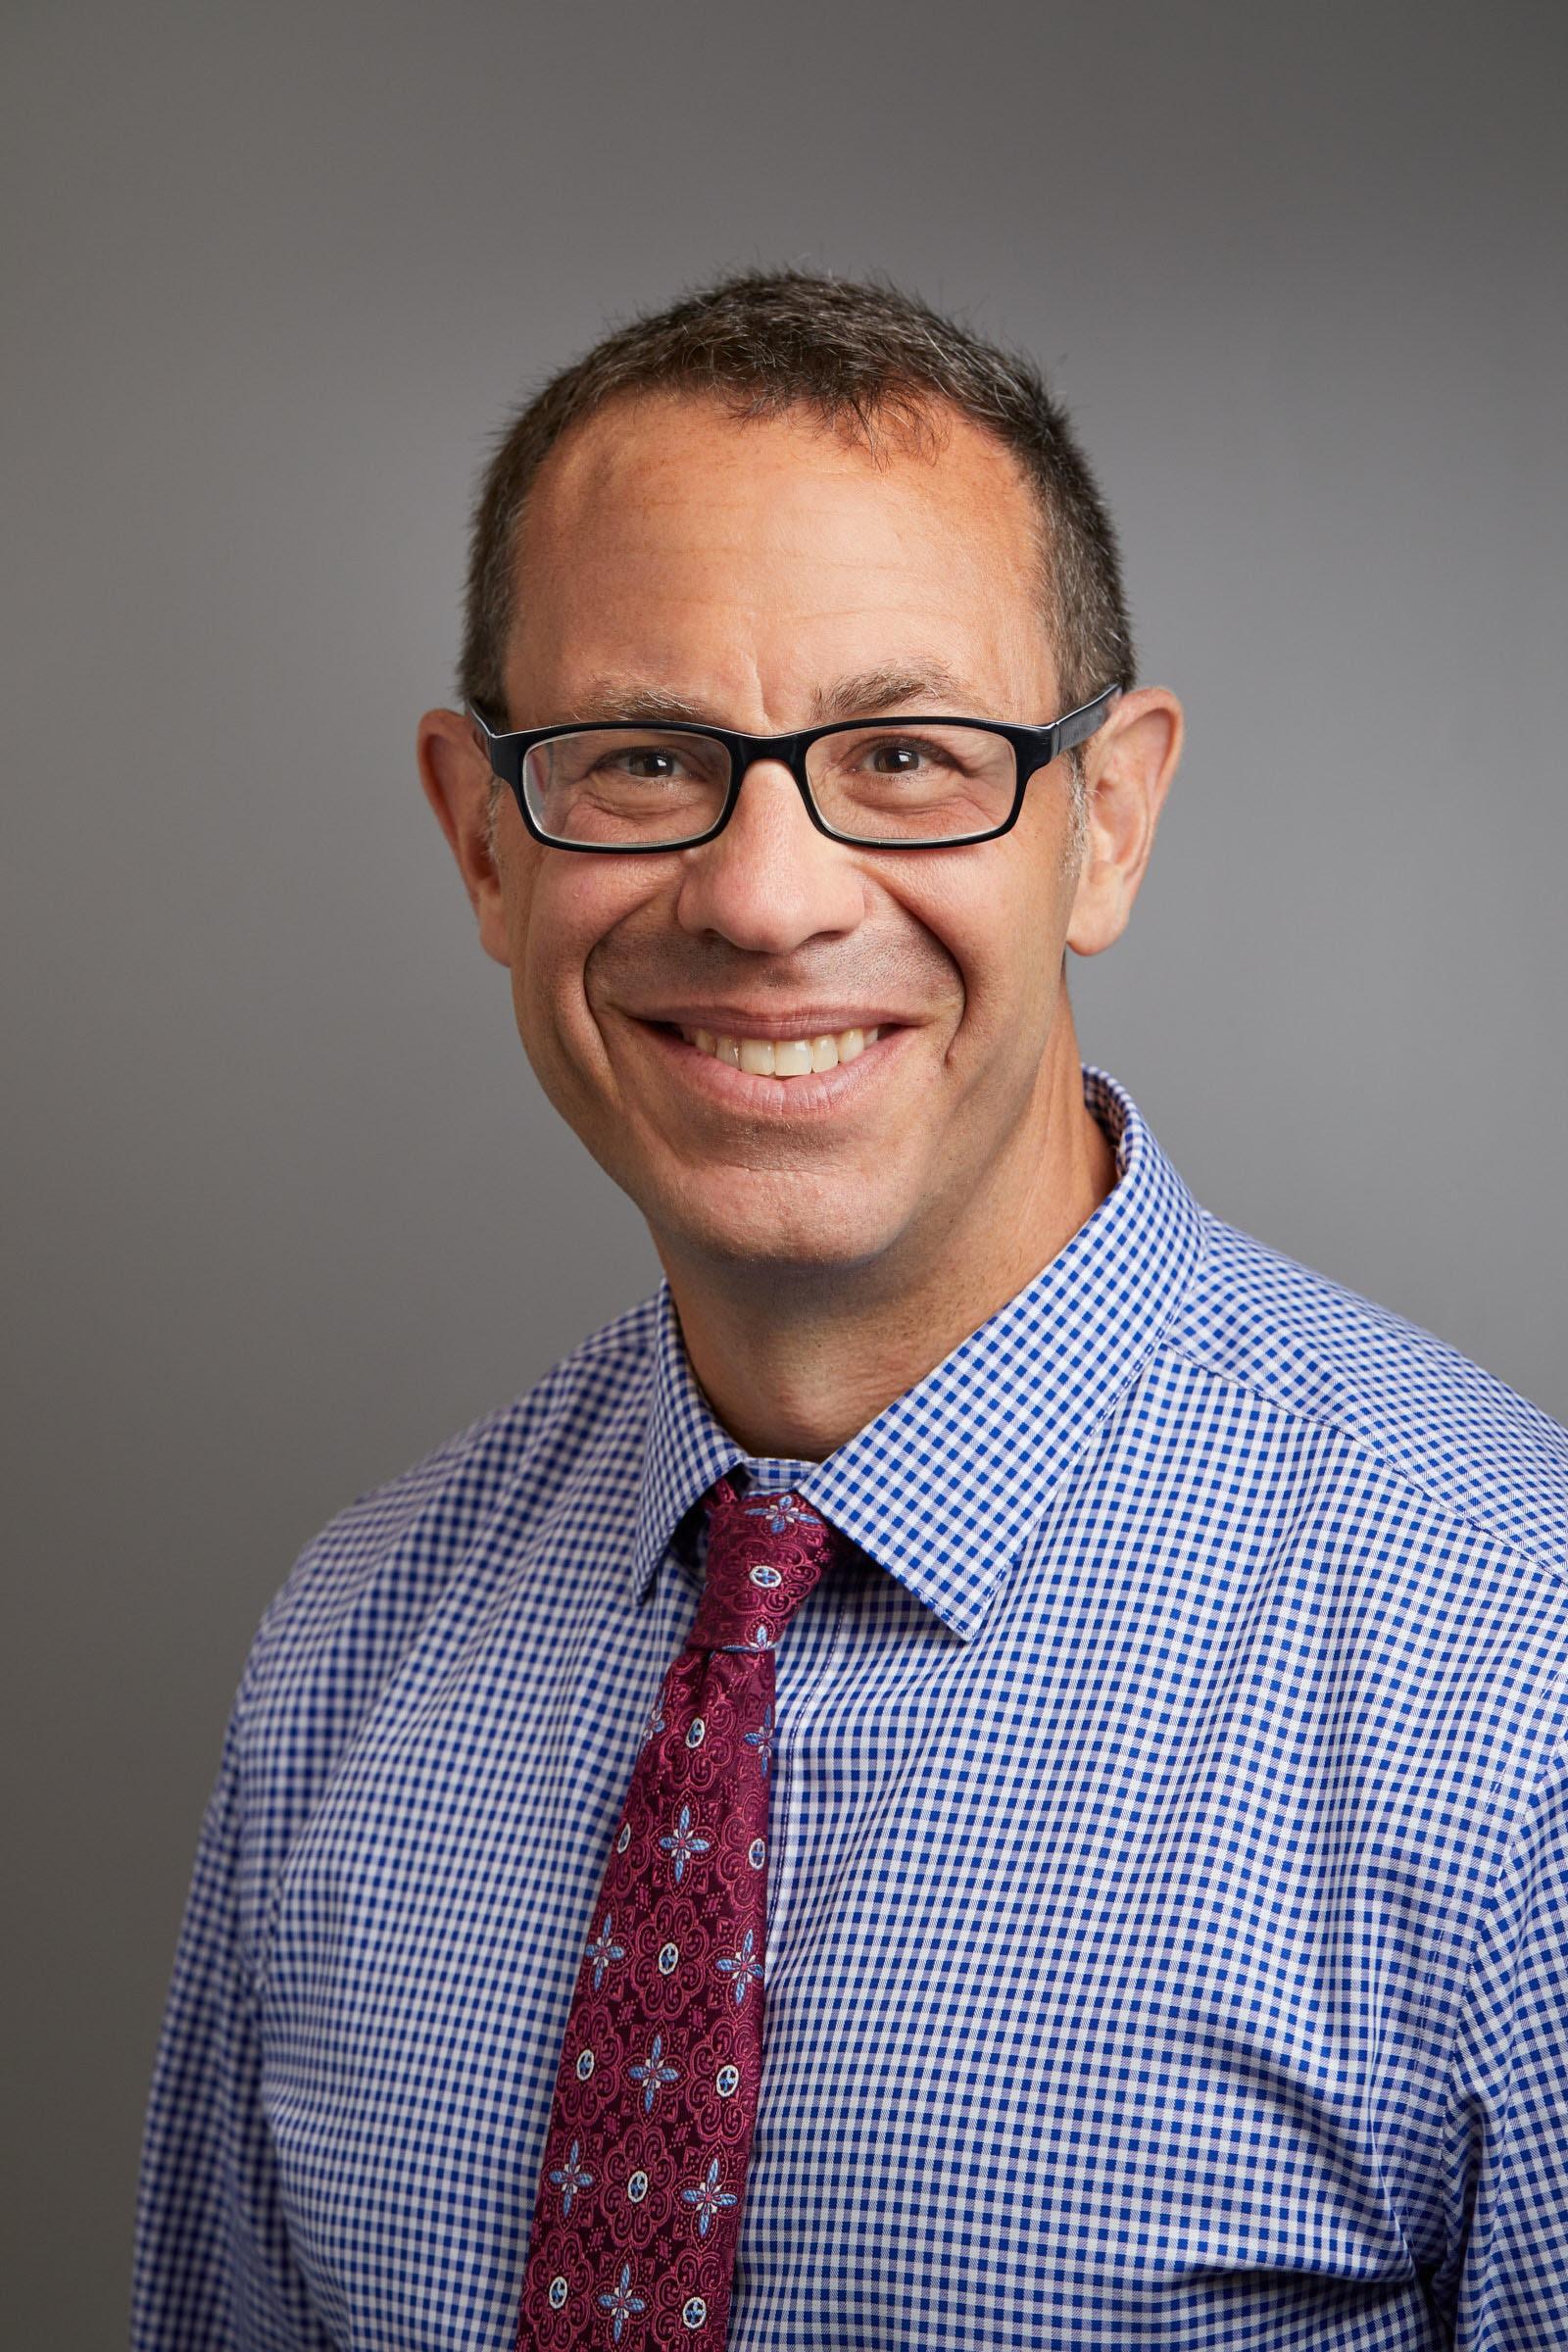 Dr. Mike Cohenuram